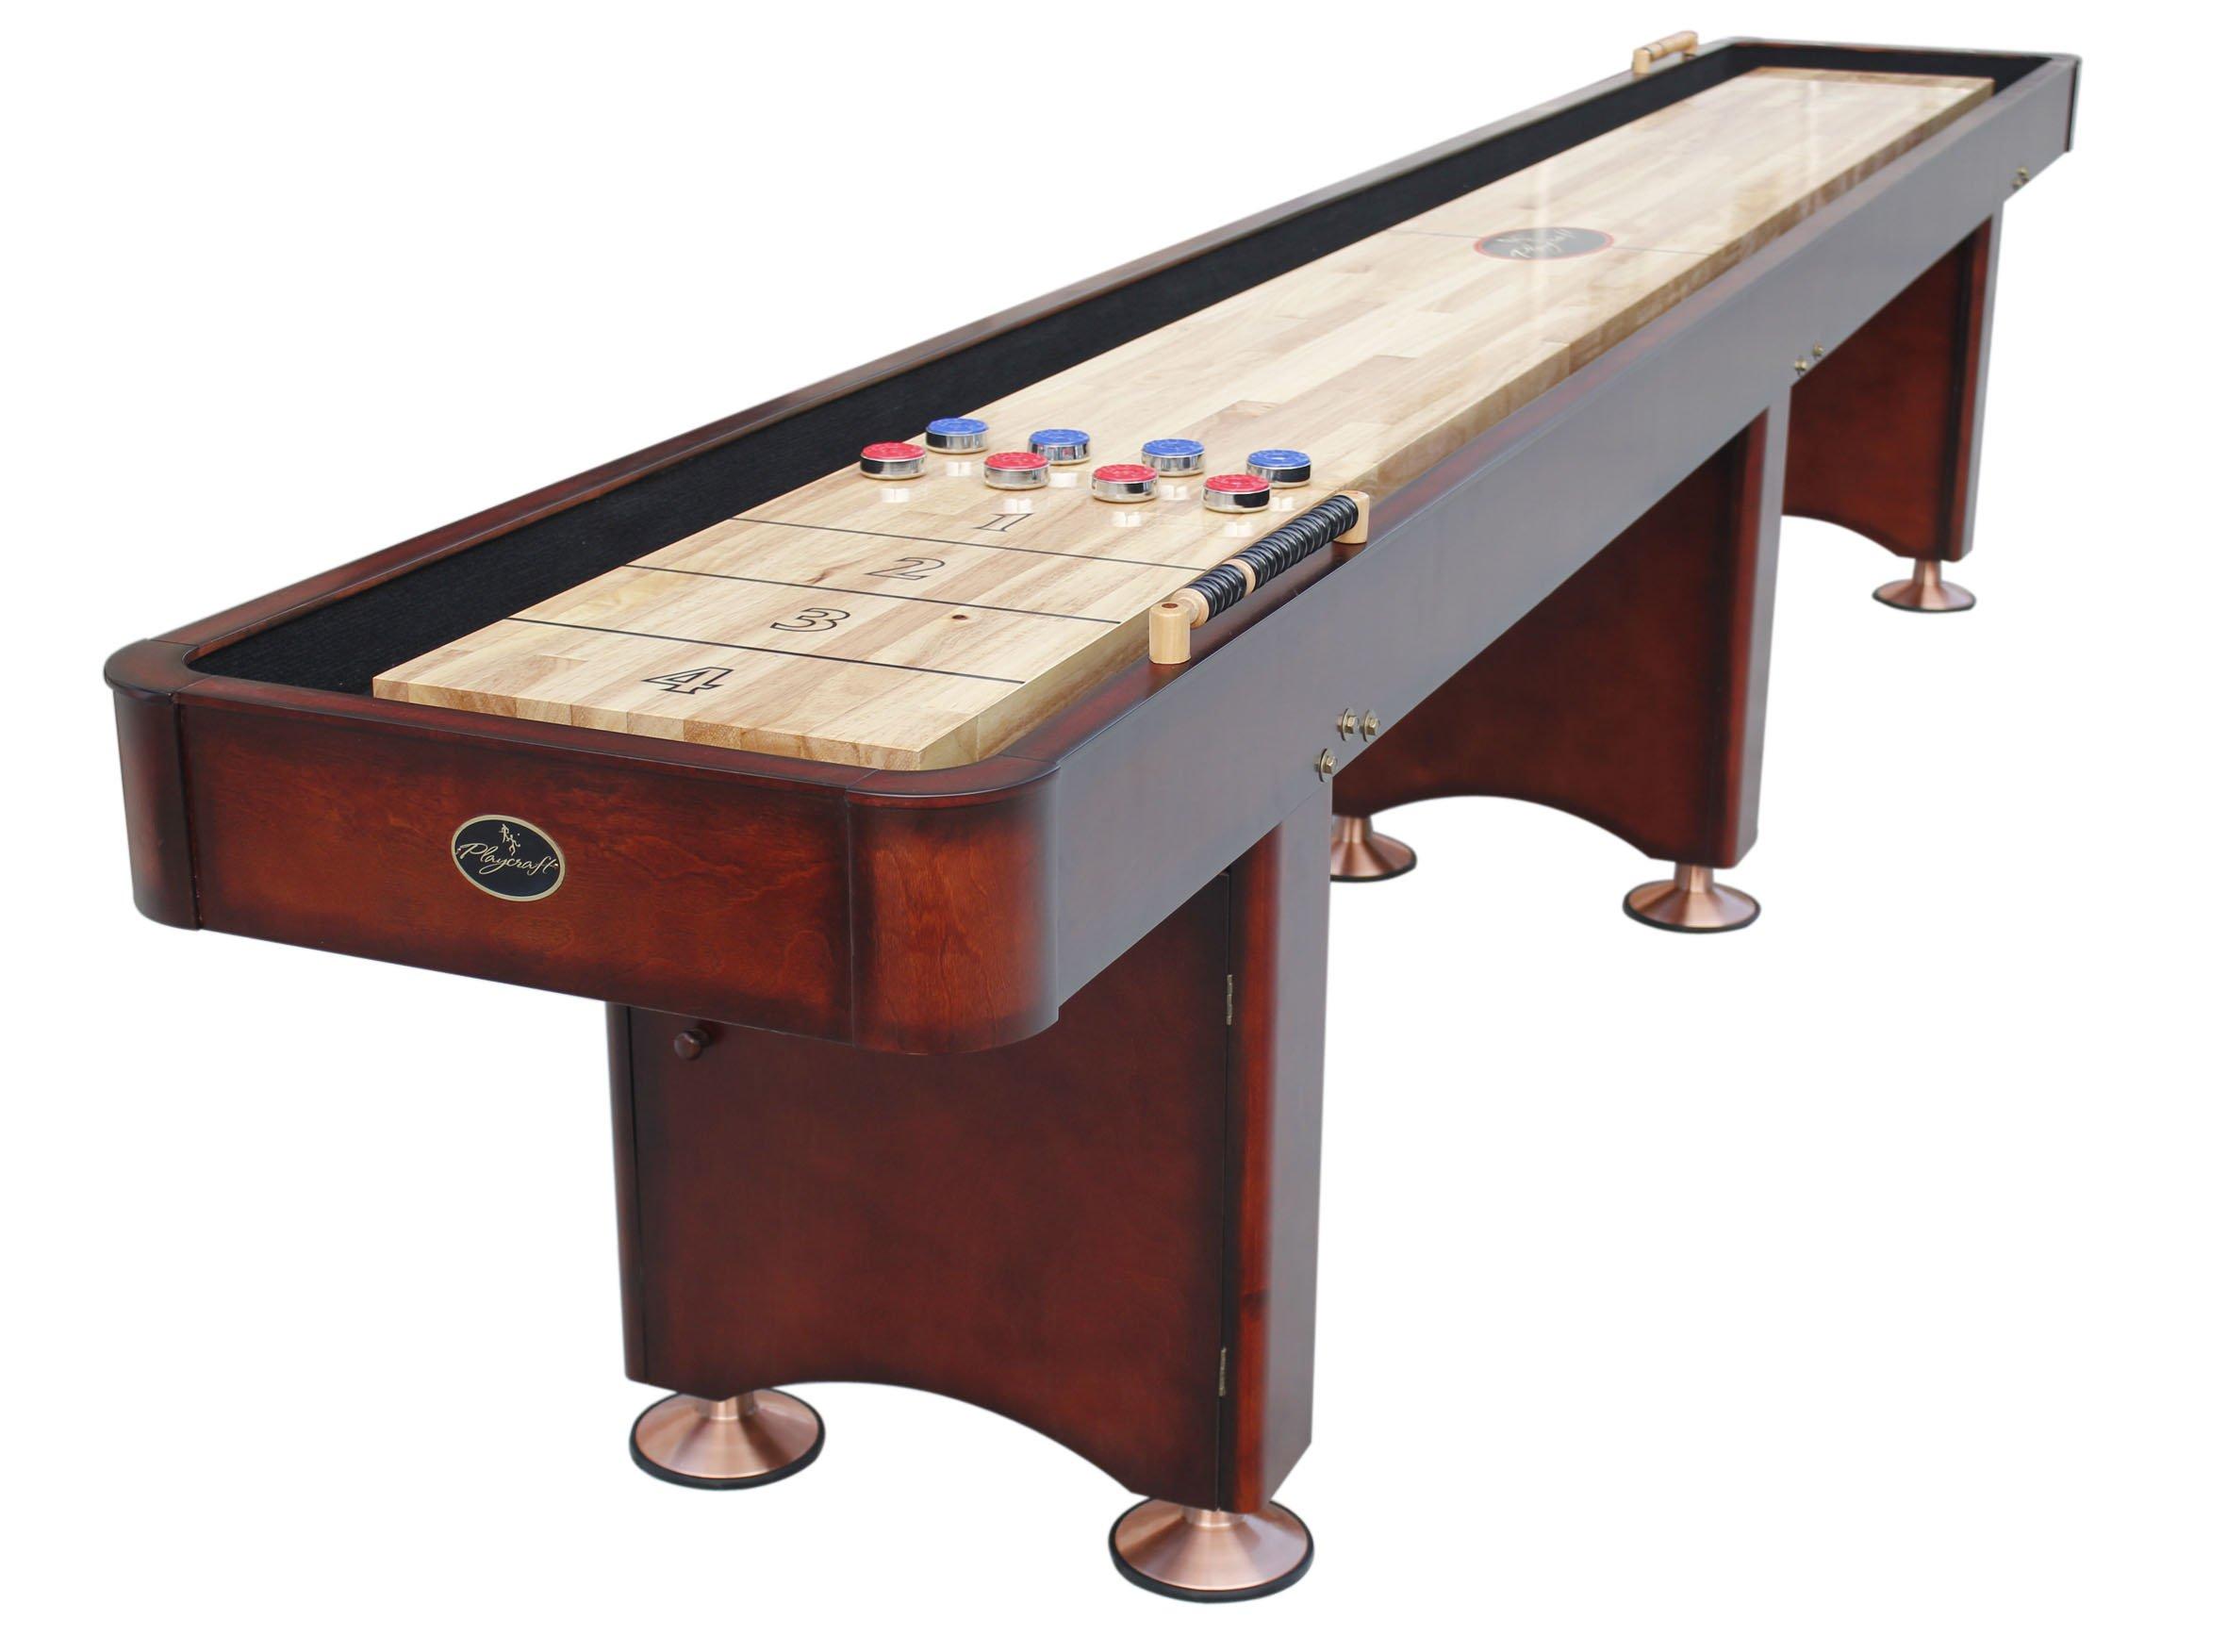 Playcraft Georgetown Cherry 14' Shuffleboard Table by Playcraft